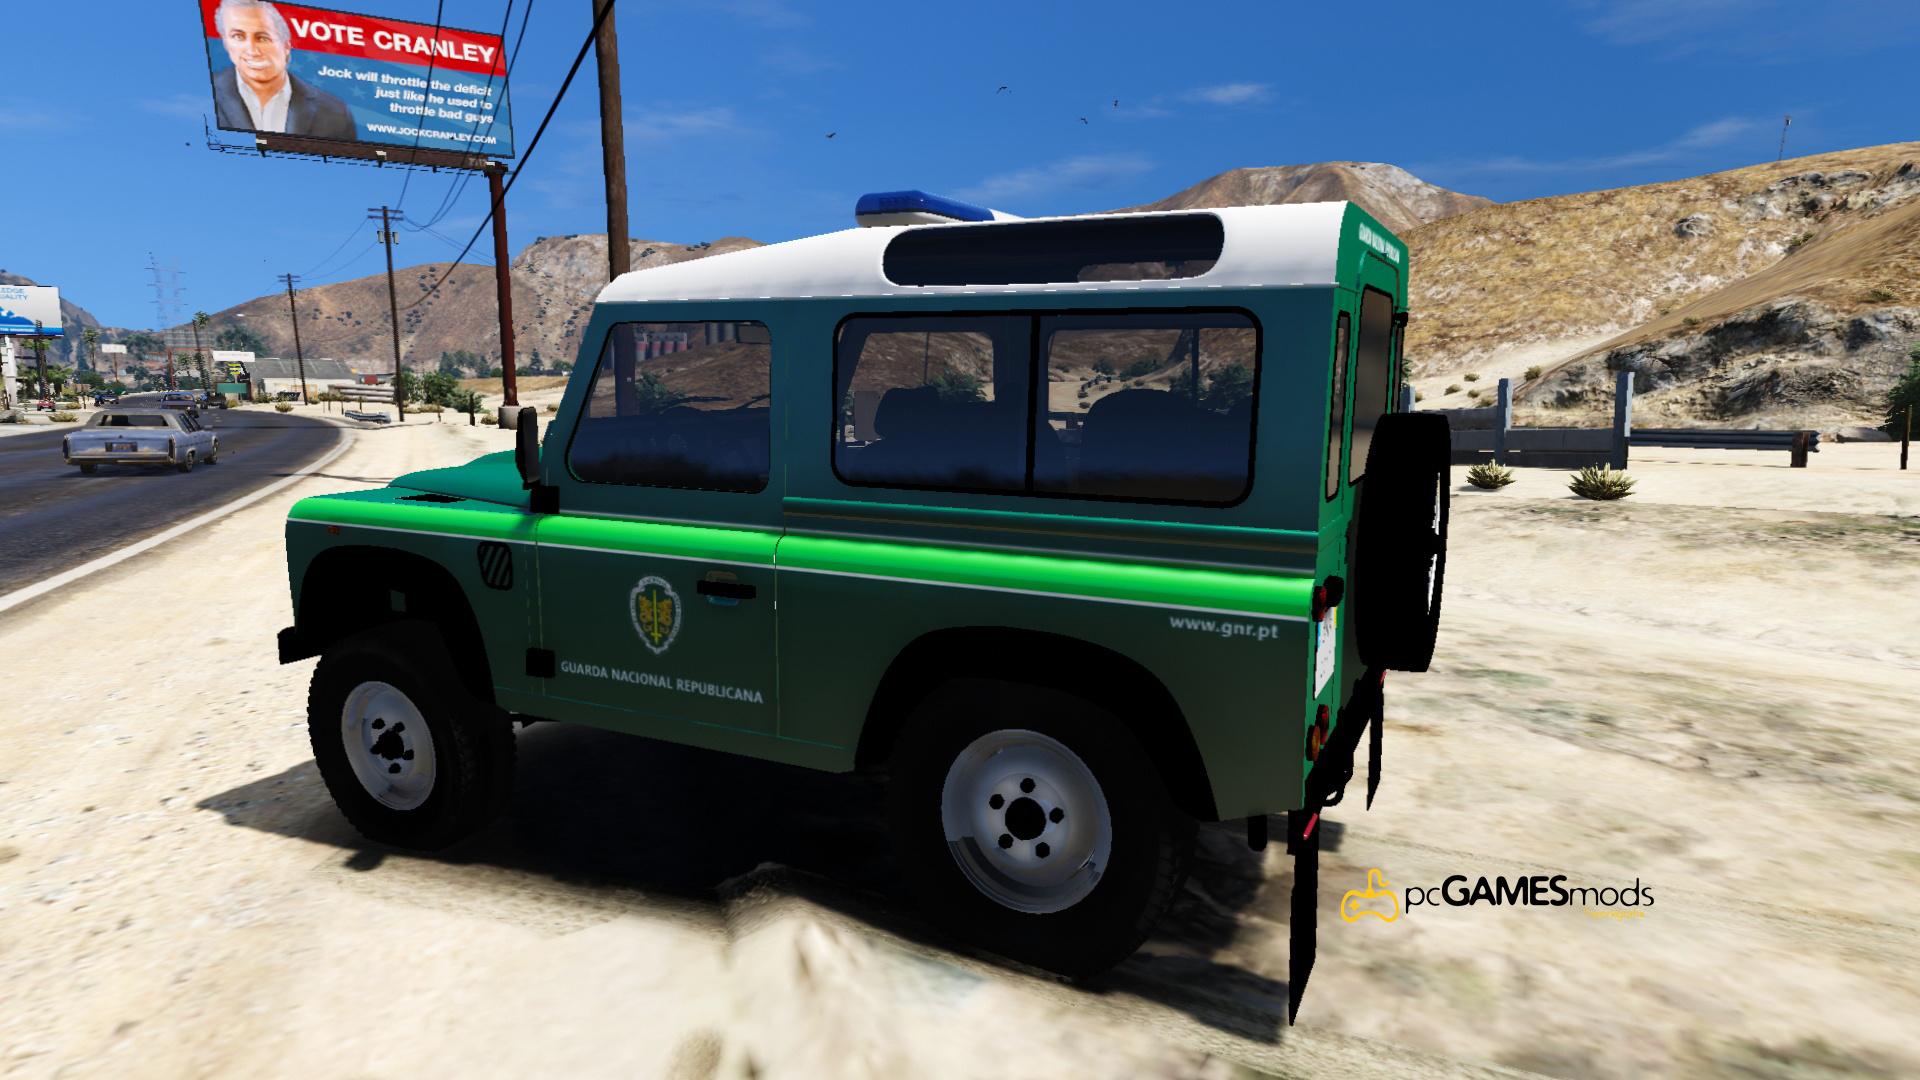 Portuguese Republican National Guard Patrol Land Rover